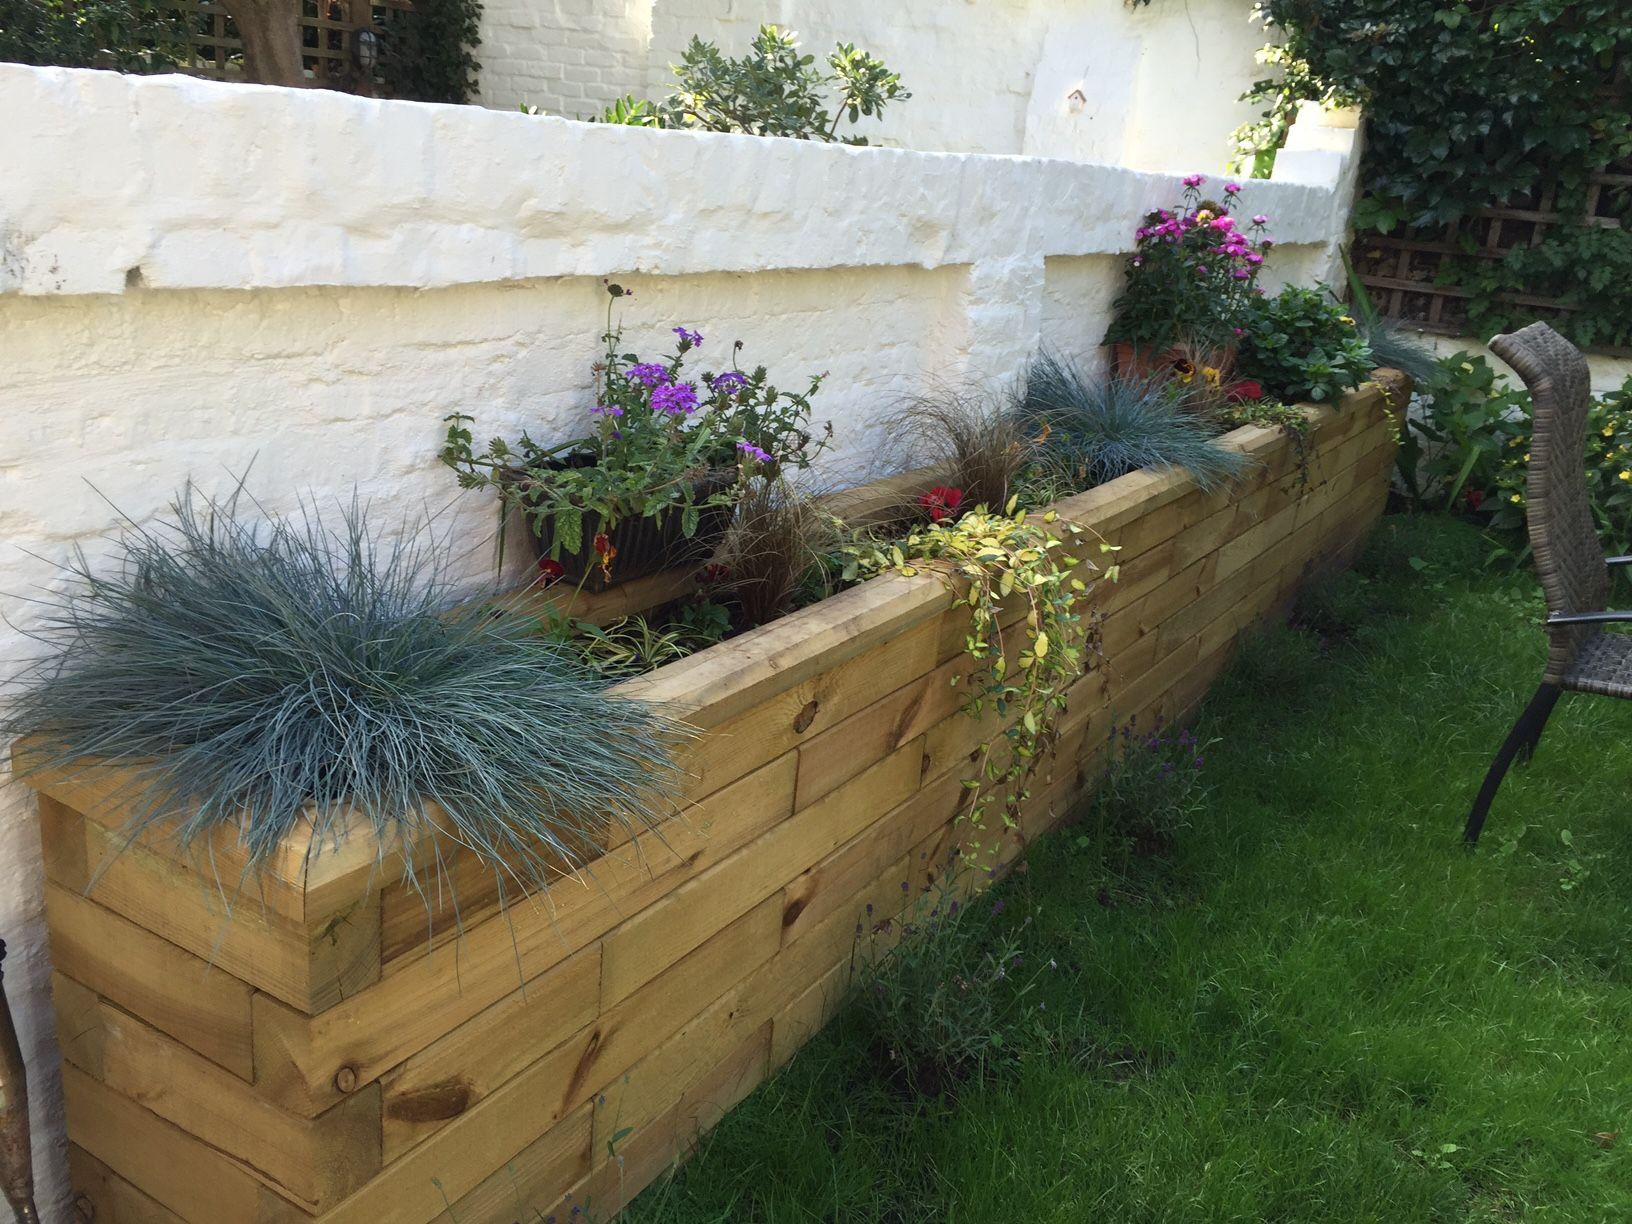 WoodBlocX Wooden Raised Planter Garden retaining wall